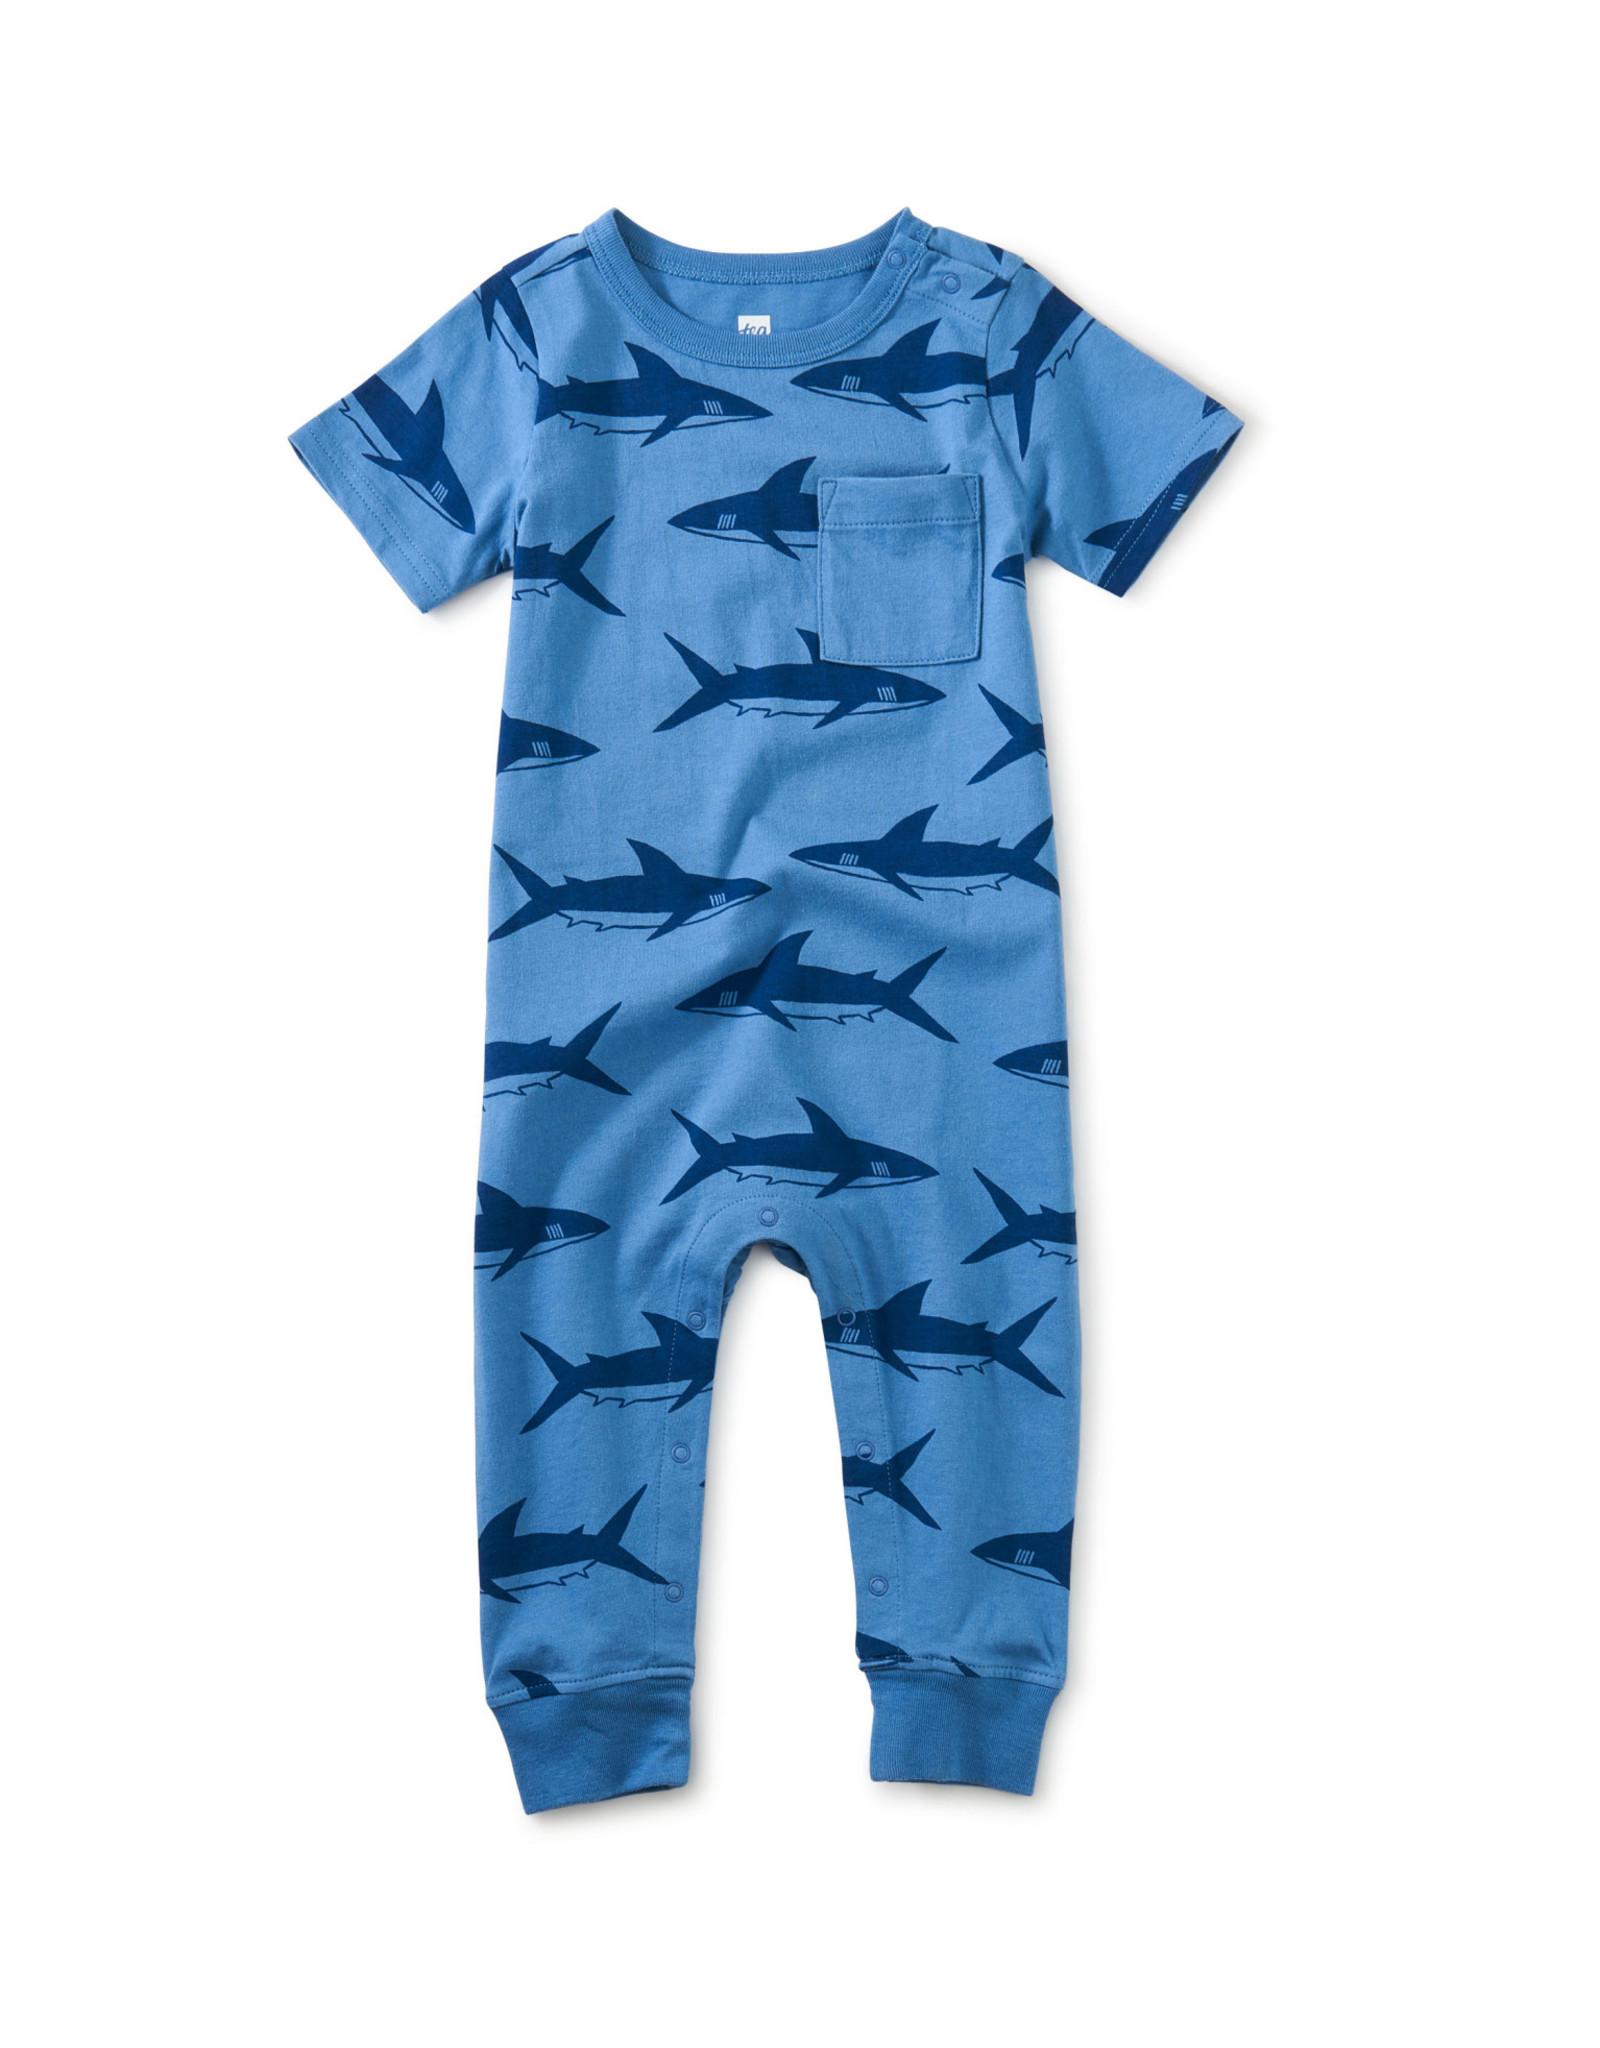 Tea Pop Pocket Baby Romper, Bull Shark